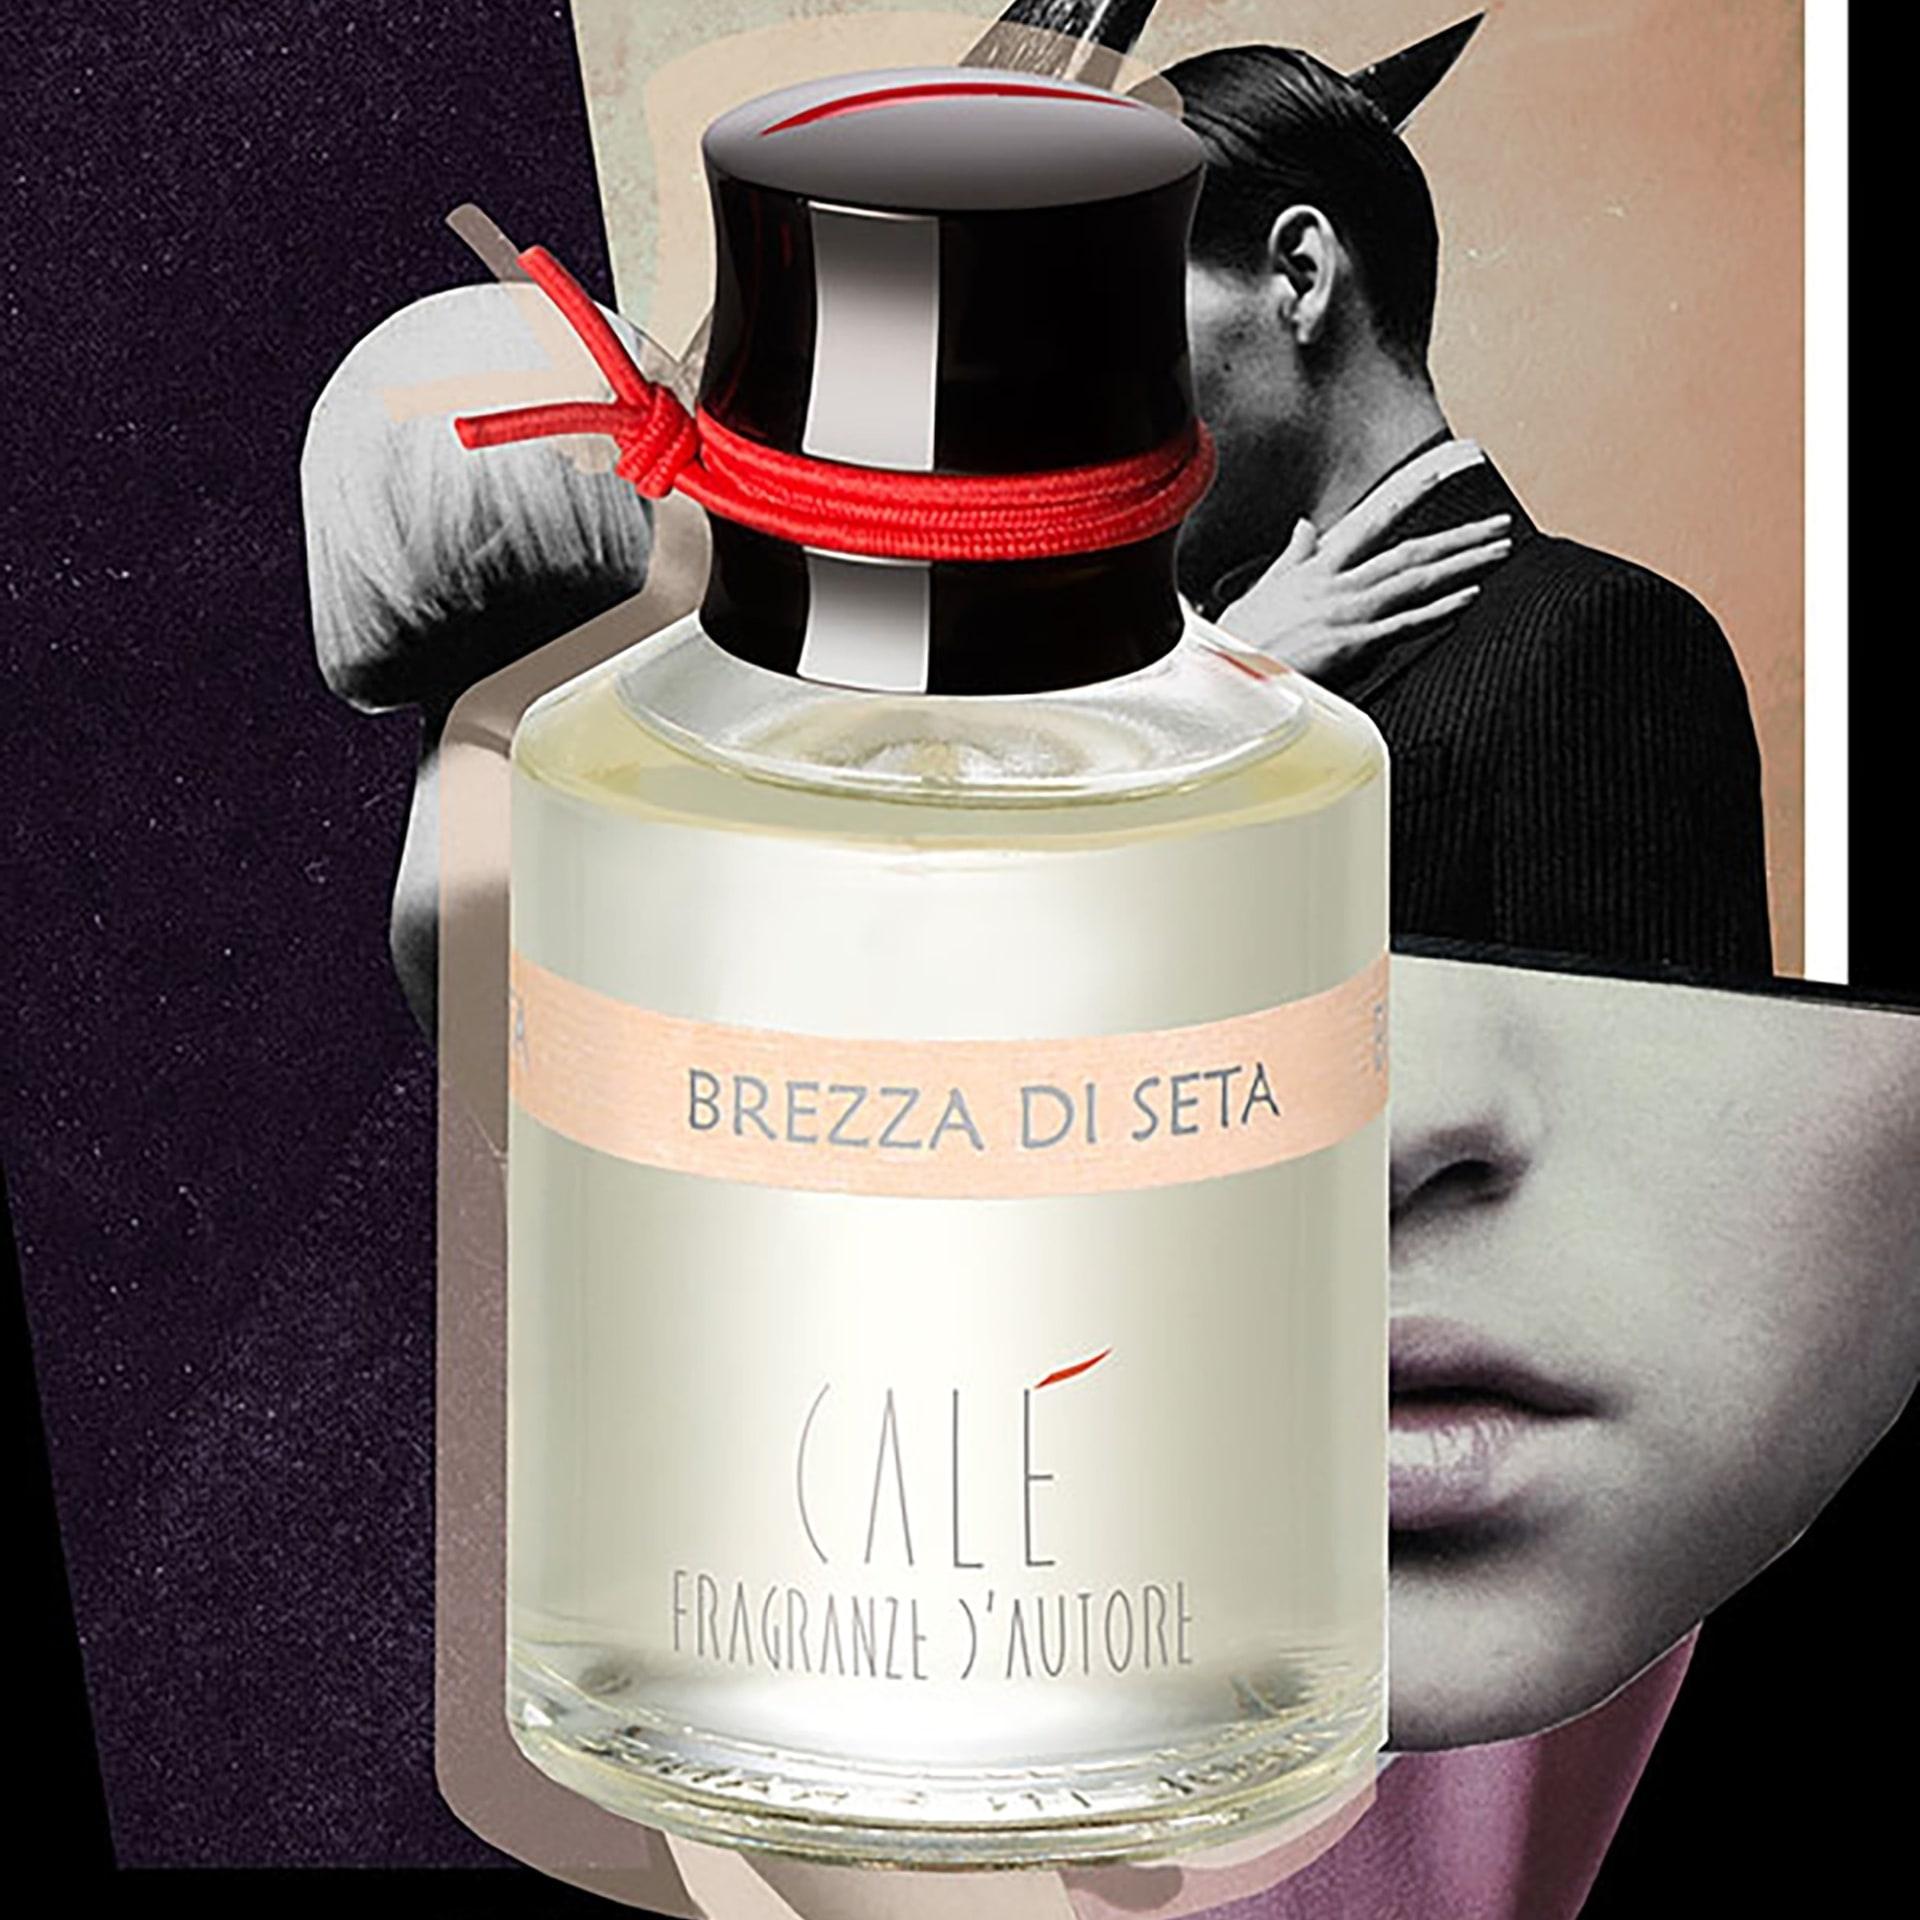 cale-fragranze-dautore-brezza-di-seta-1